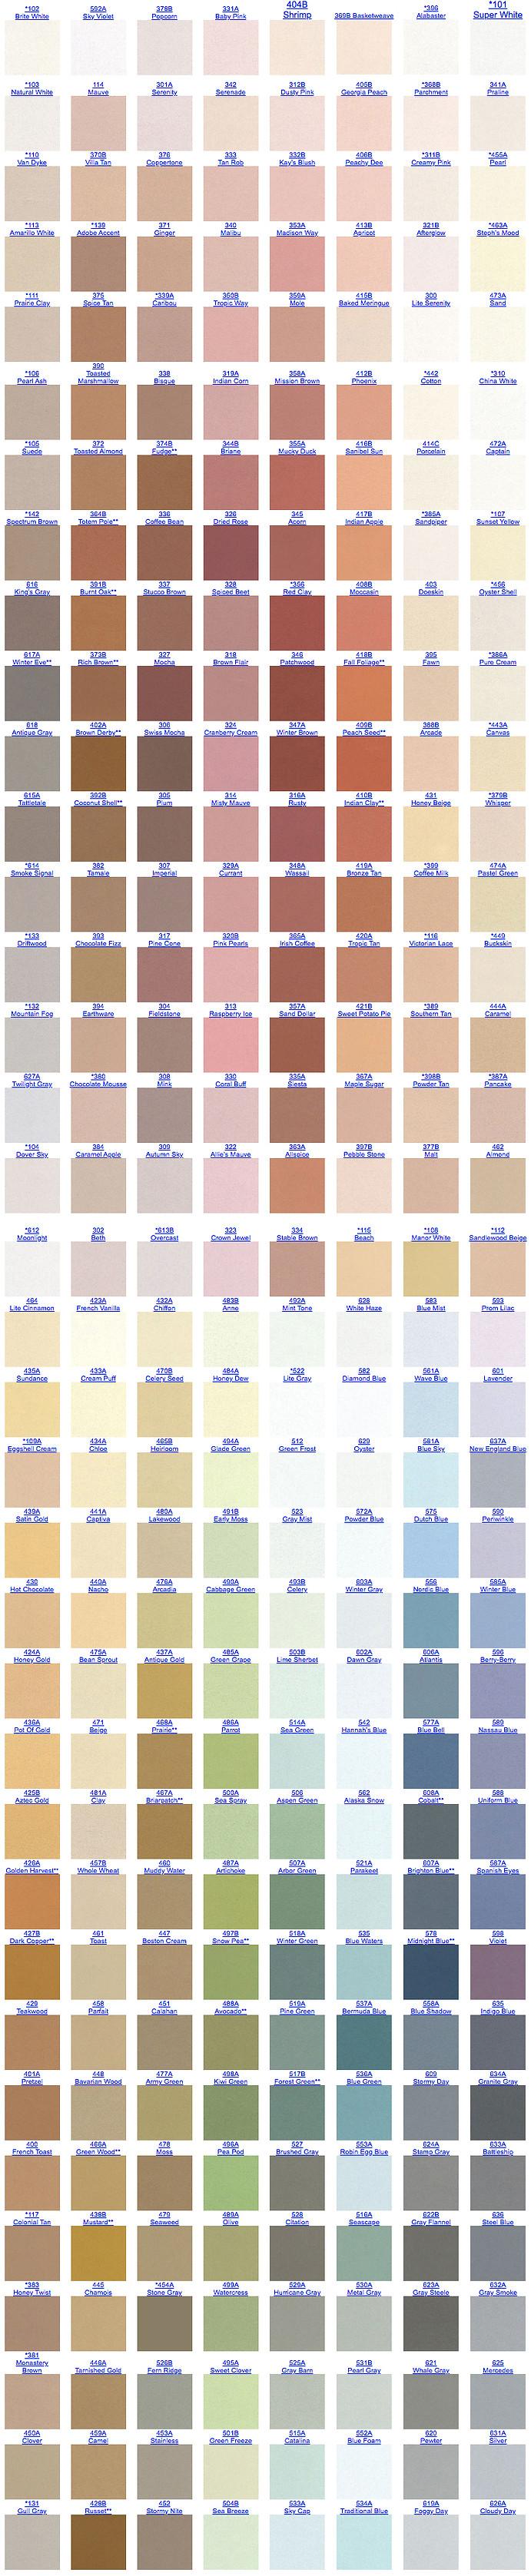 dryvit-color-chart.jpg